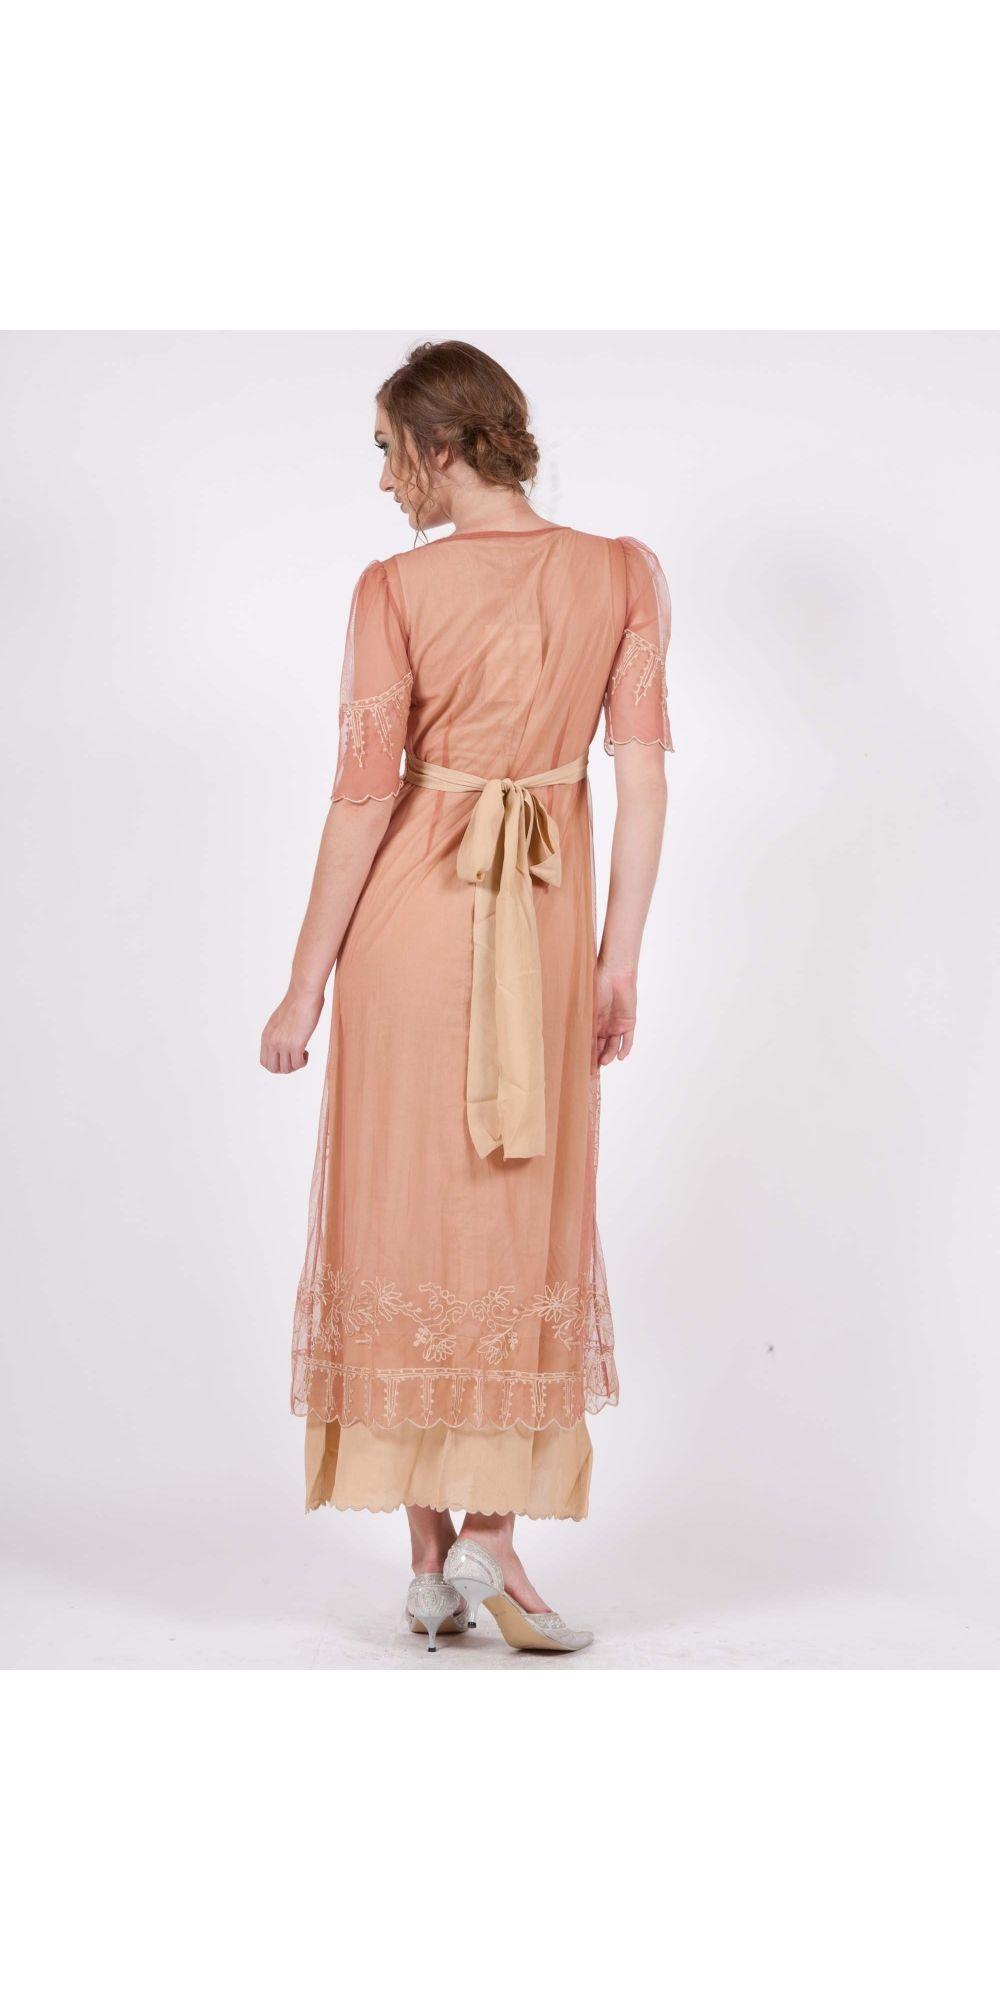 40007 New Vintage Titanic Dress in Rose/Gold